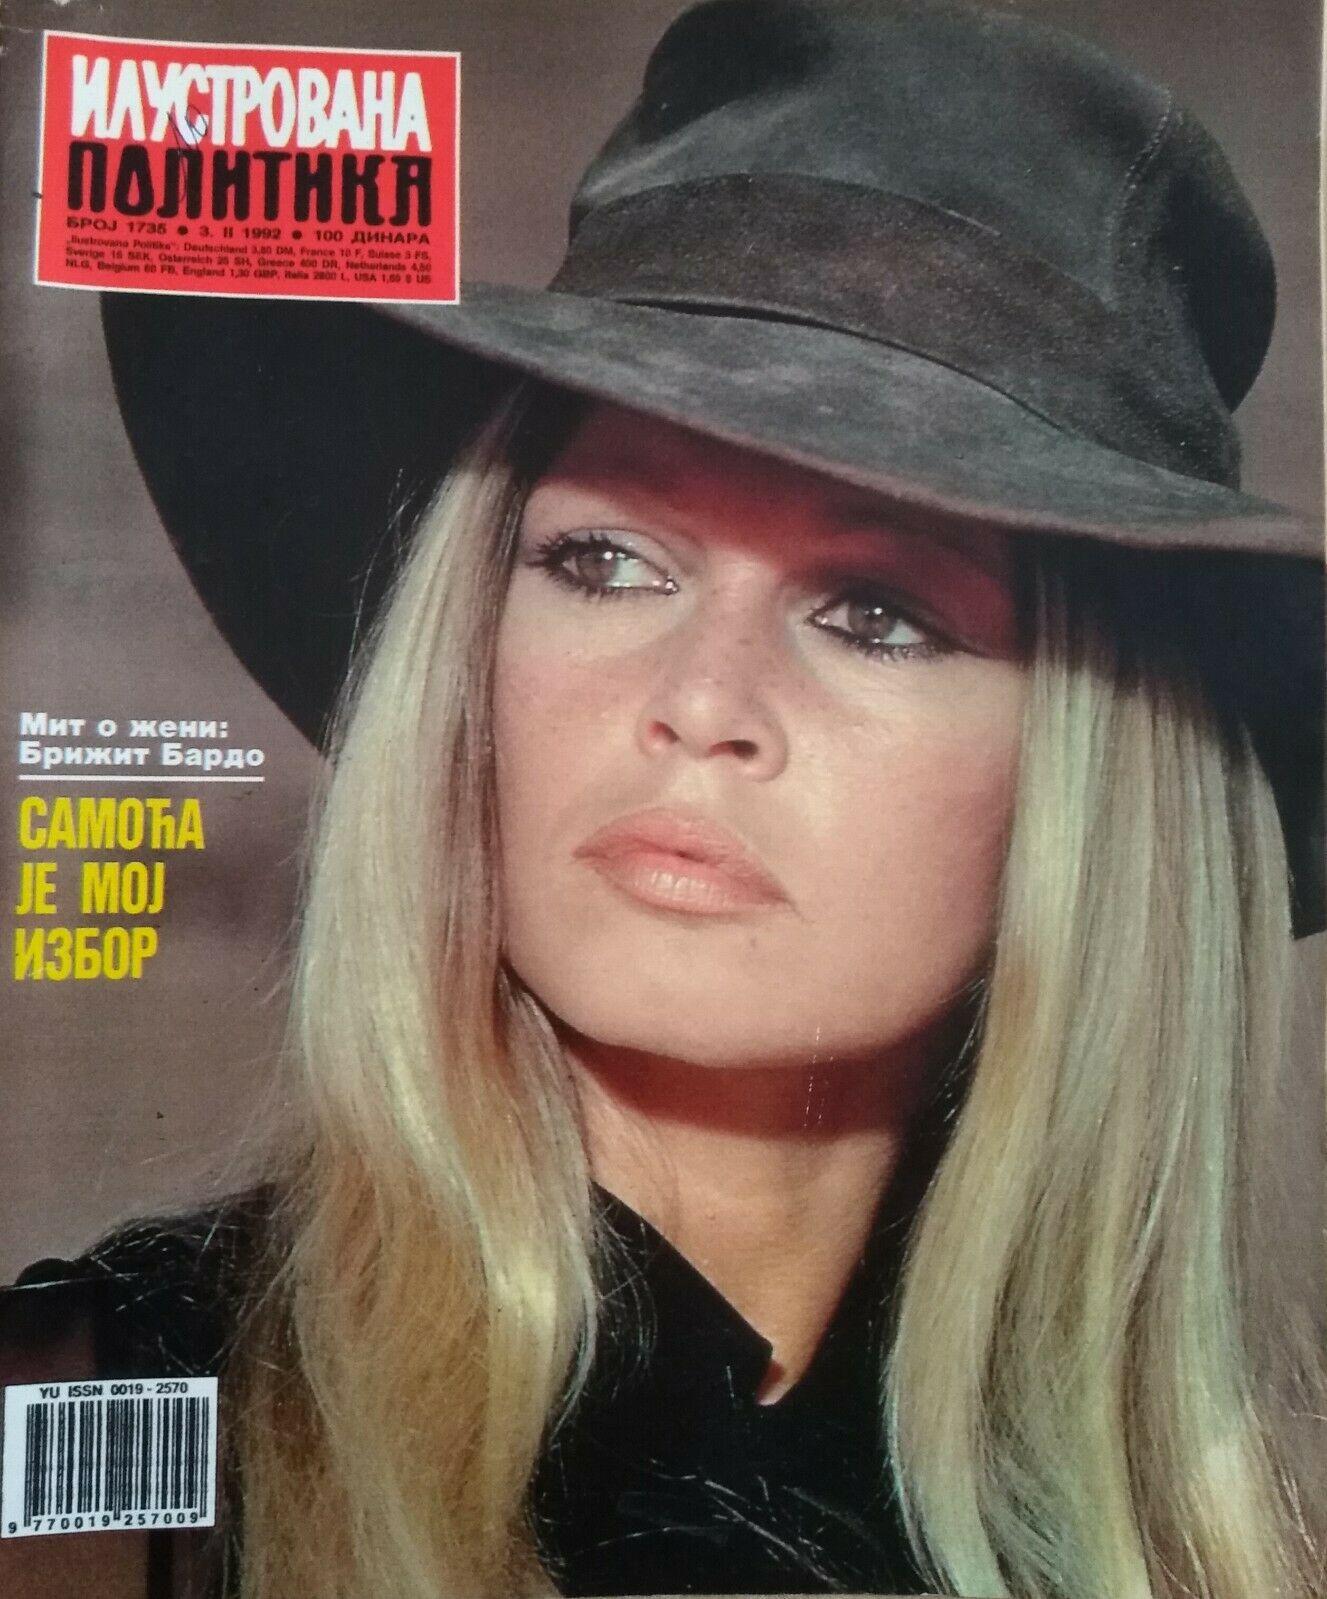 Revue n°1735 de 1992 (Serbie)